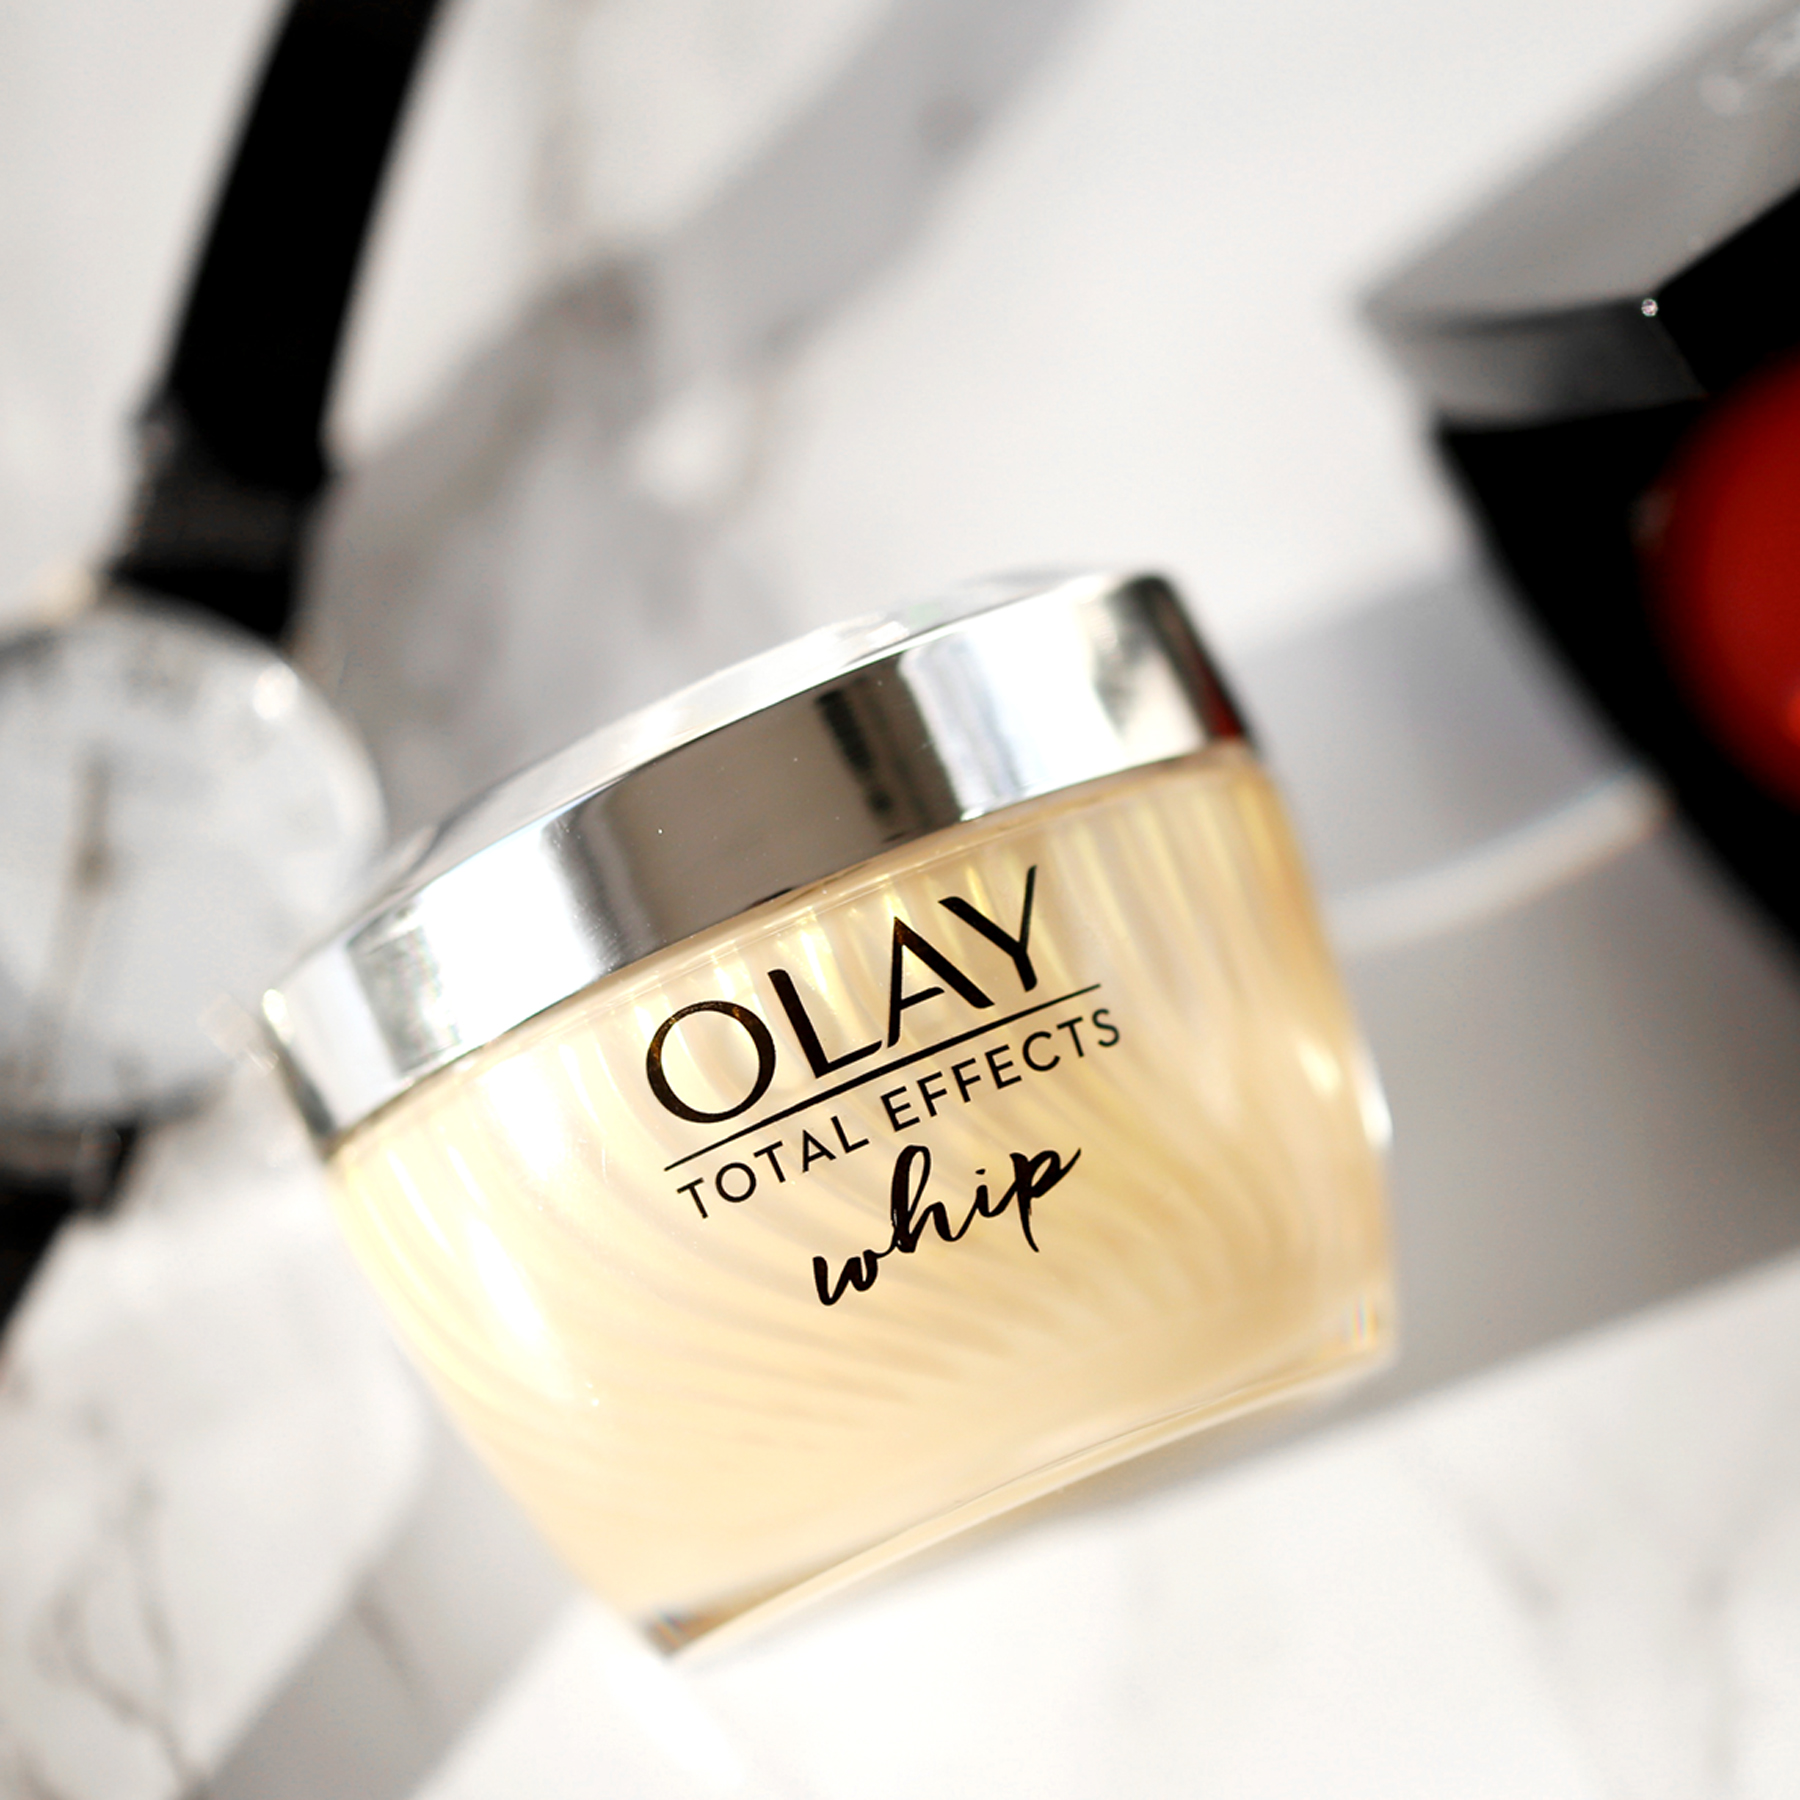 olay whips moisturizer review - woahstyle.com - beauty blog by nathalie martin_6744.jpg